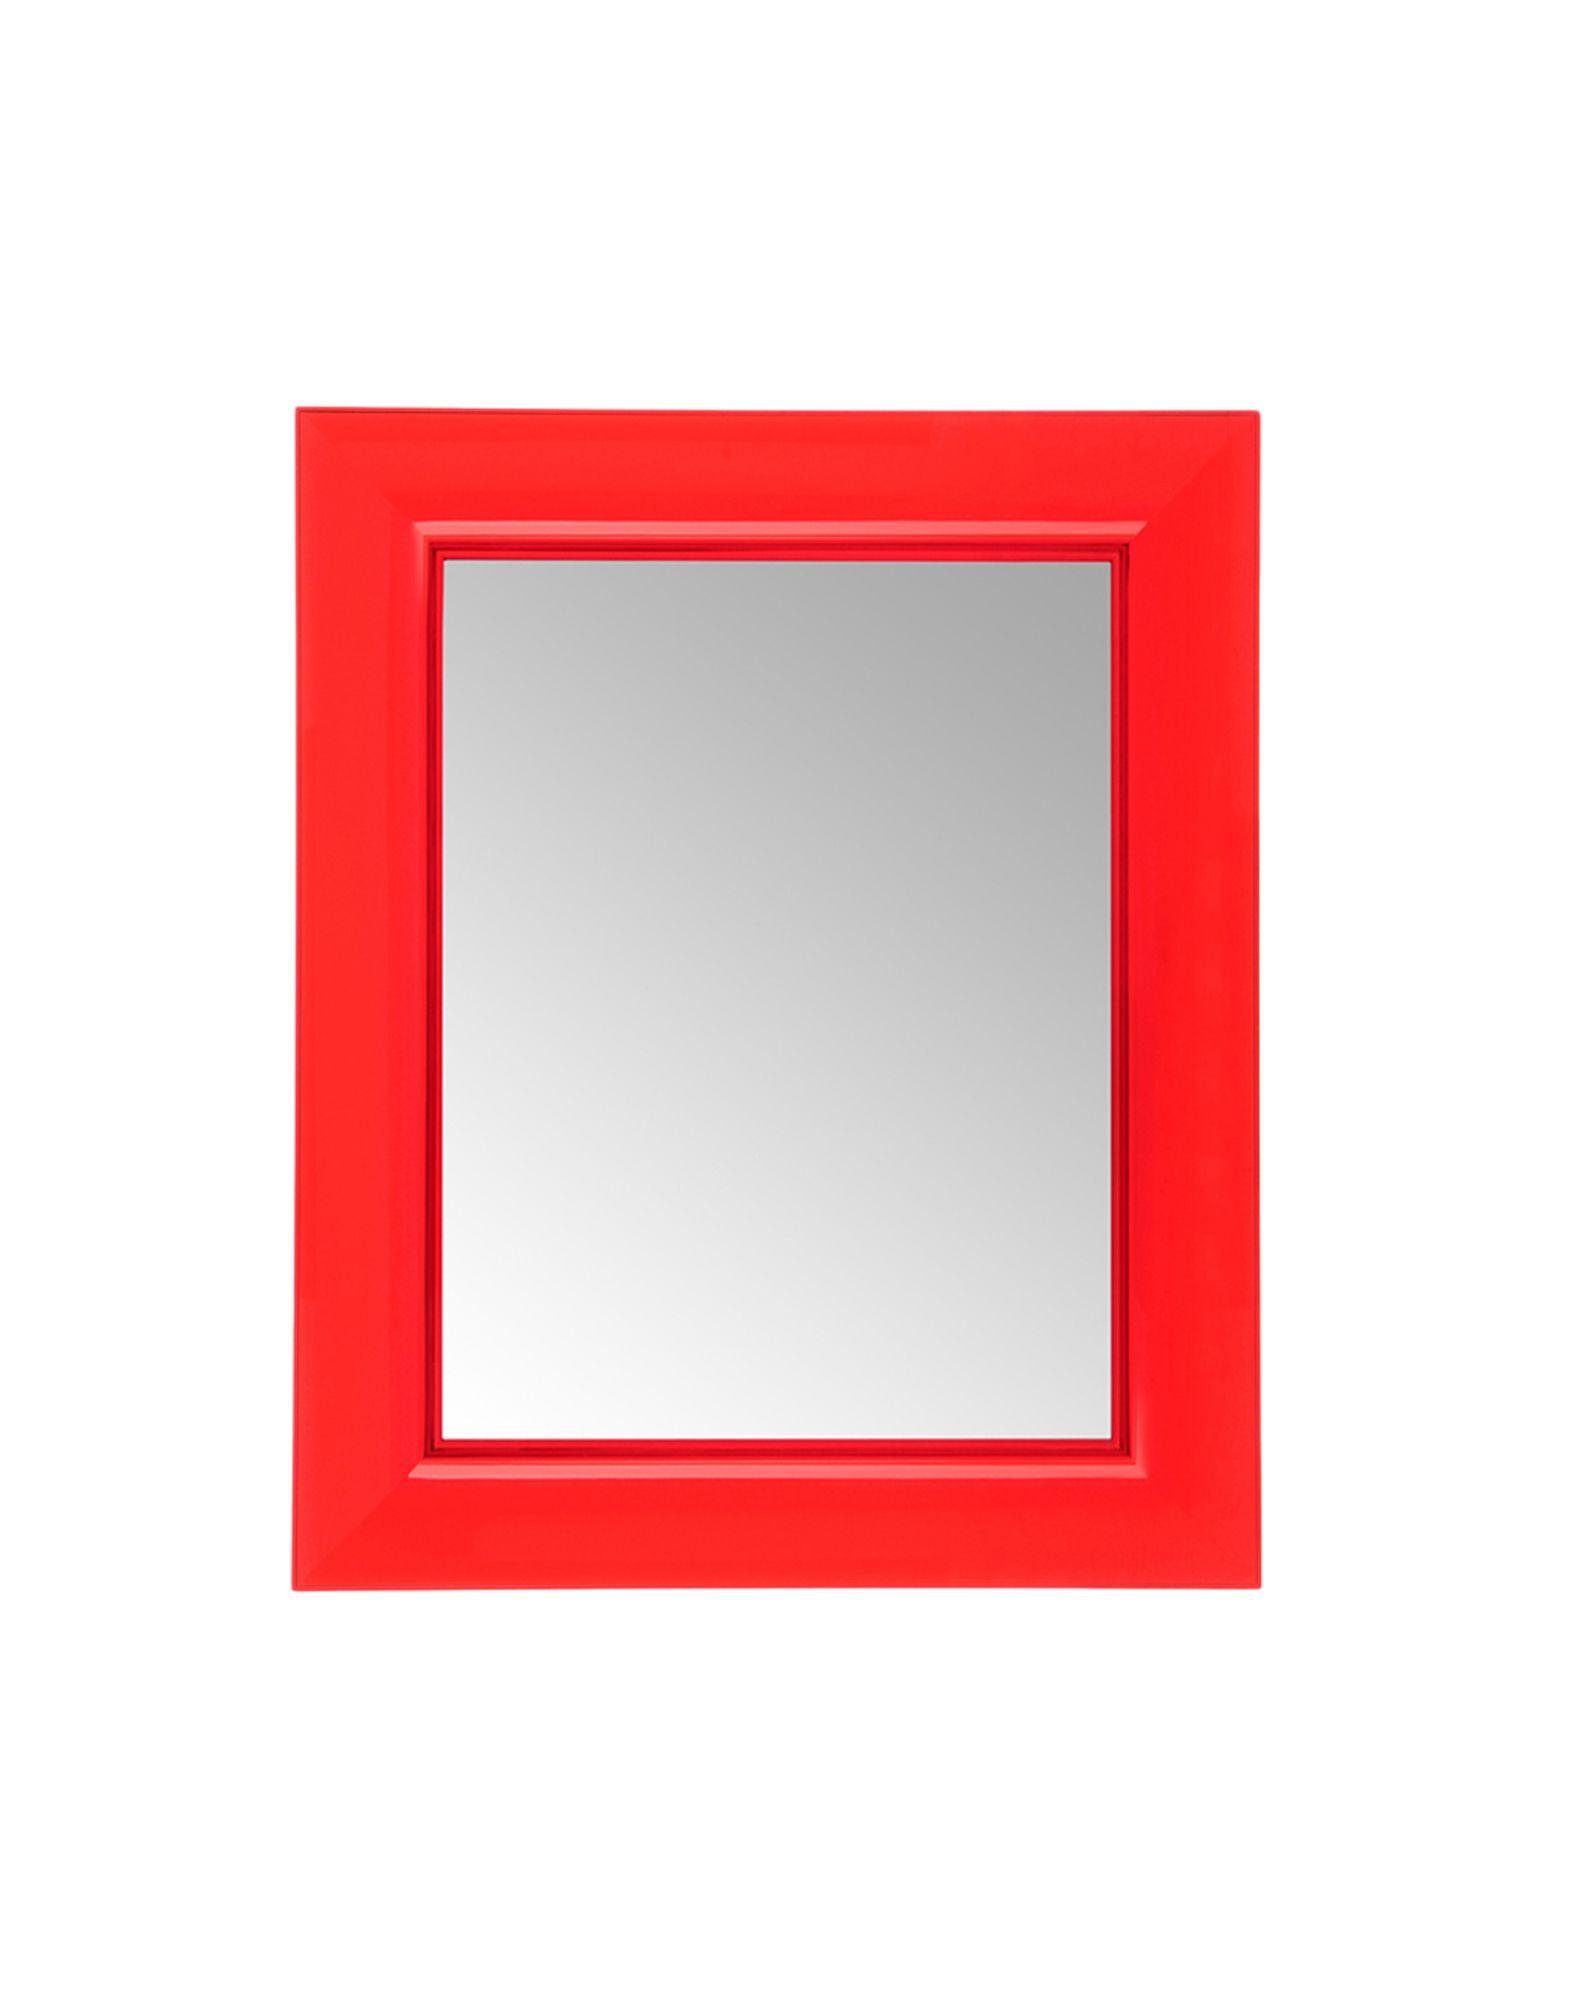 Kartell specchio francois ghost rosso trasparente specchi newformsdesign - Kartell specchio ghost ...